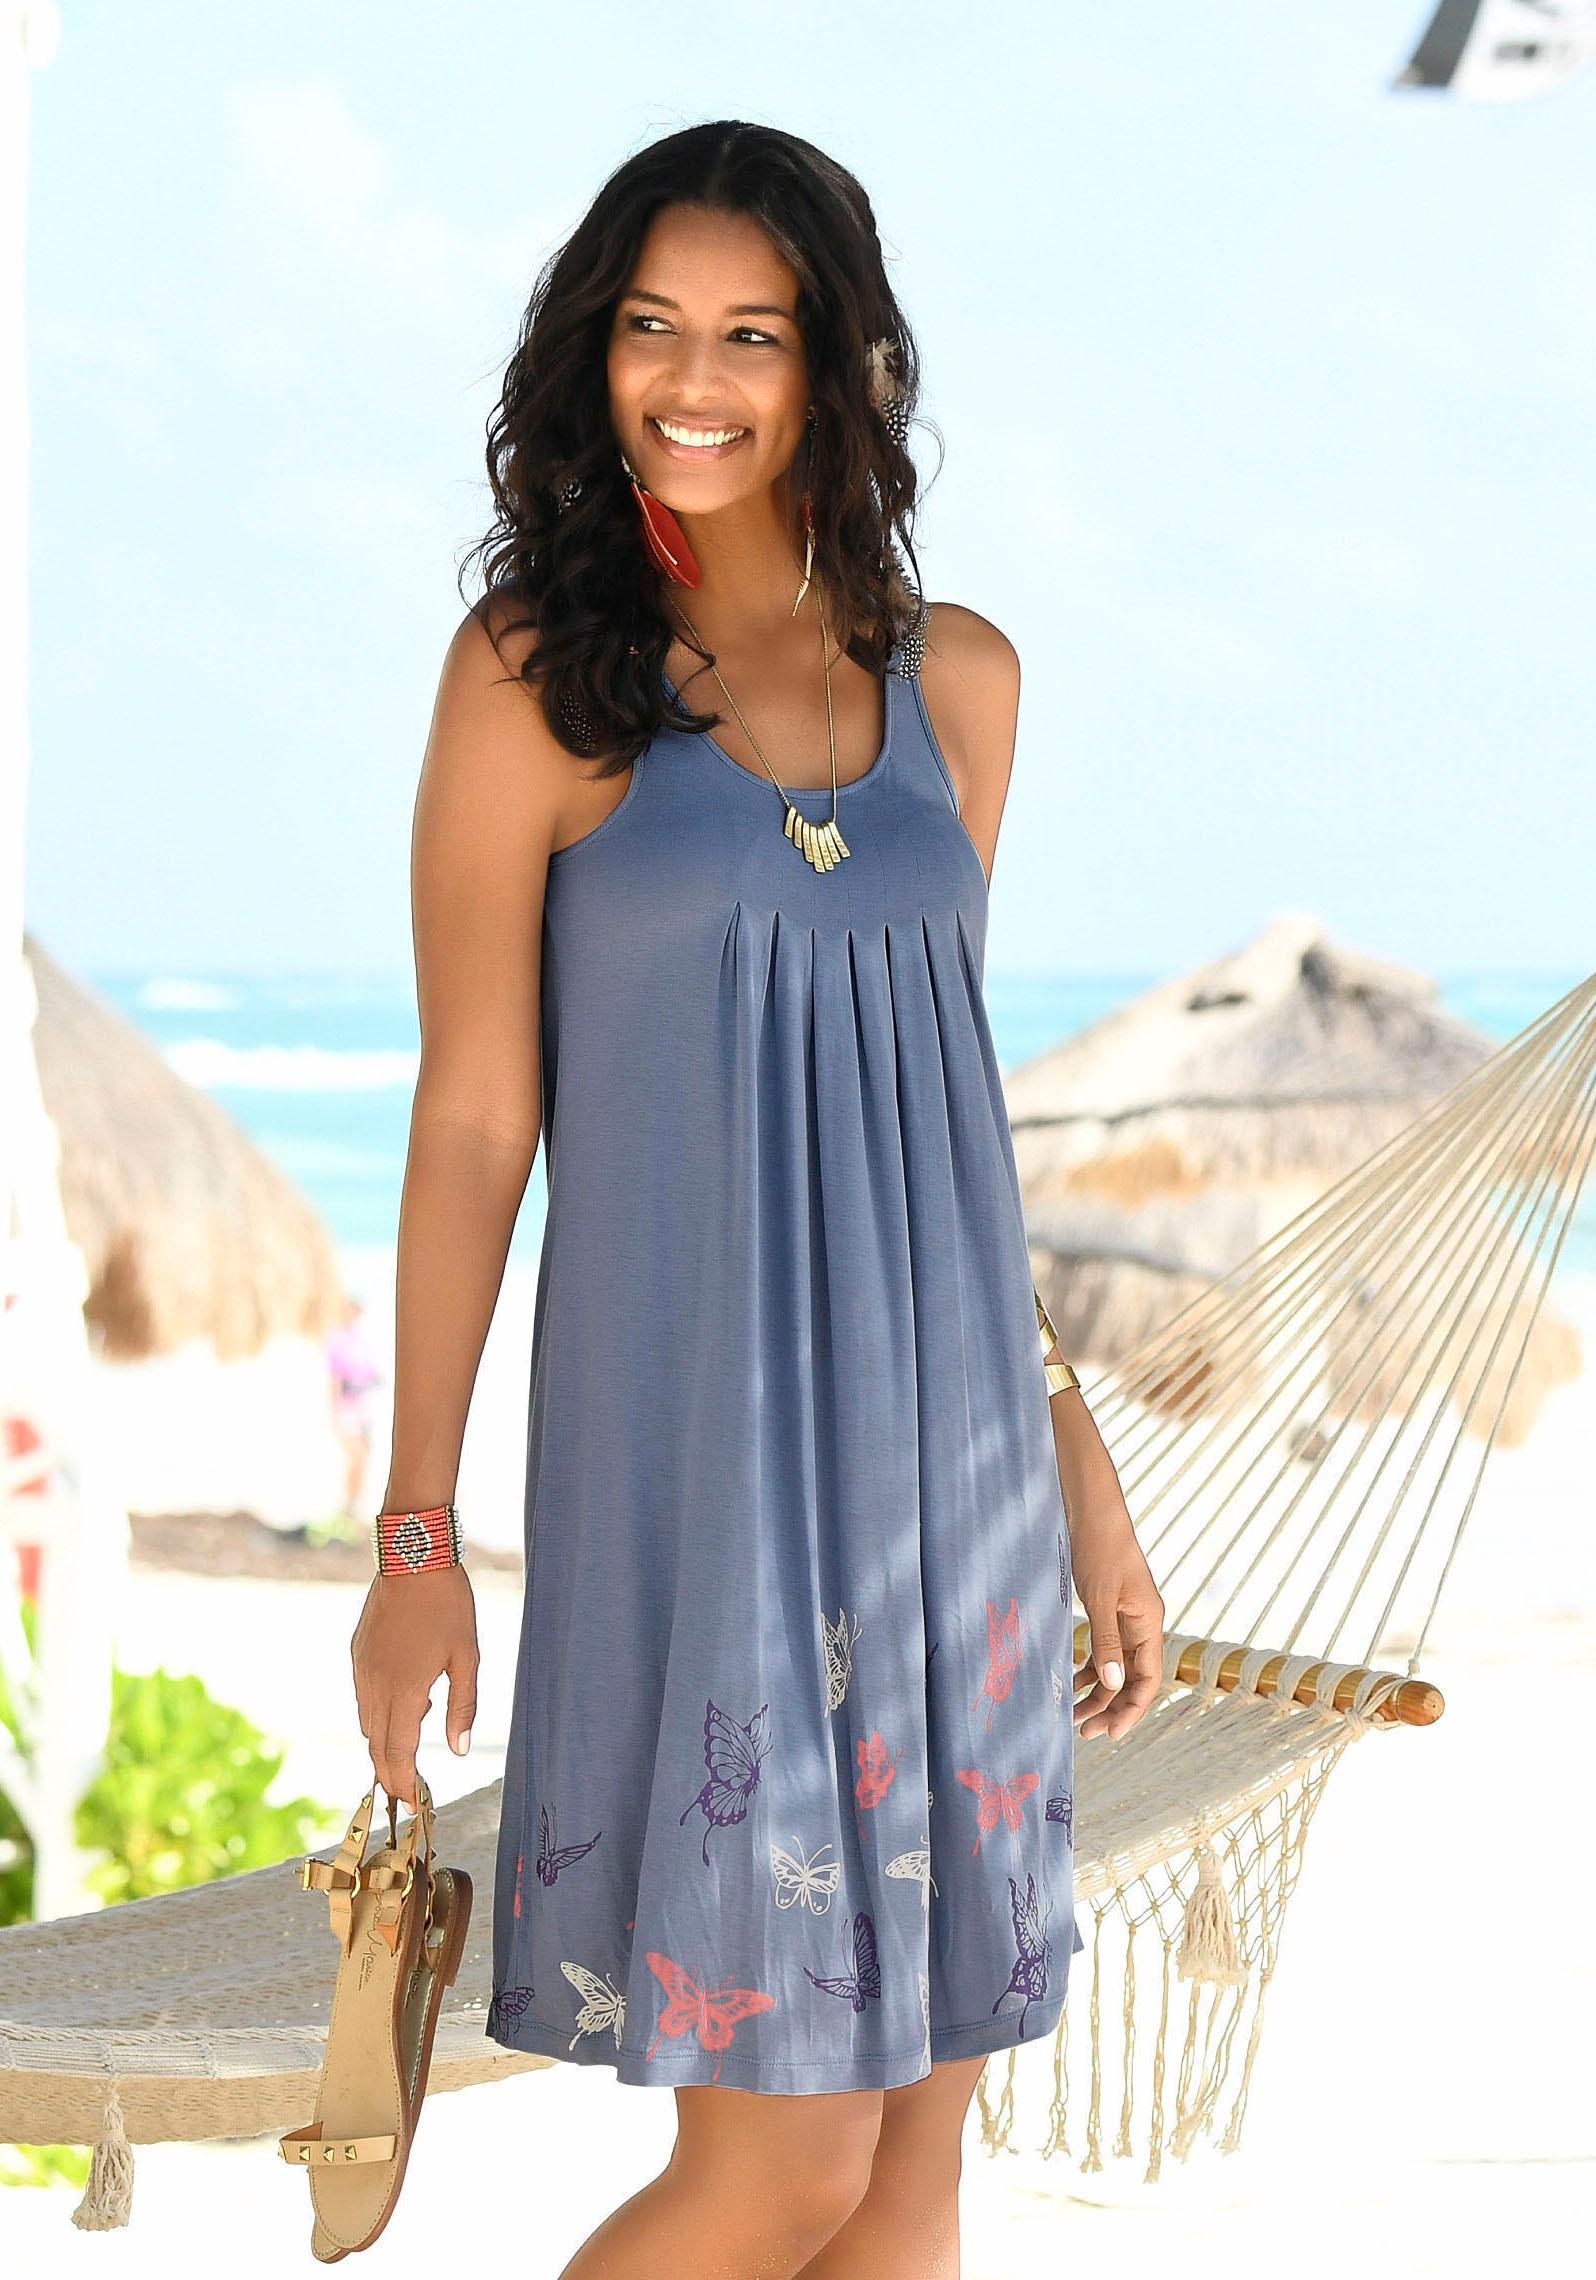 Beachtime Strandkleid mit Schmetterlingsdruck